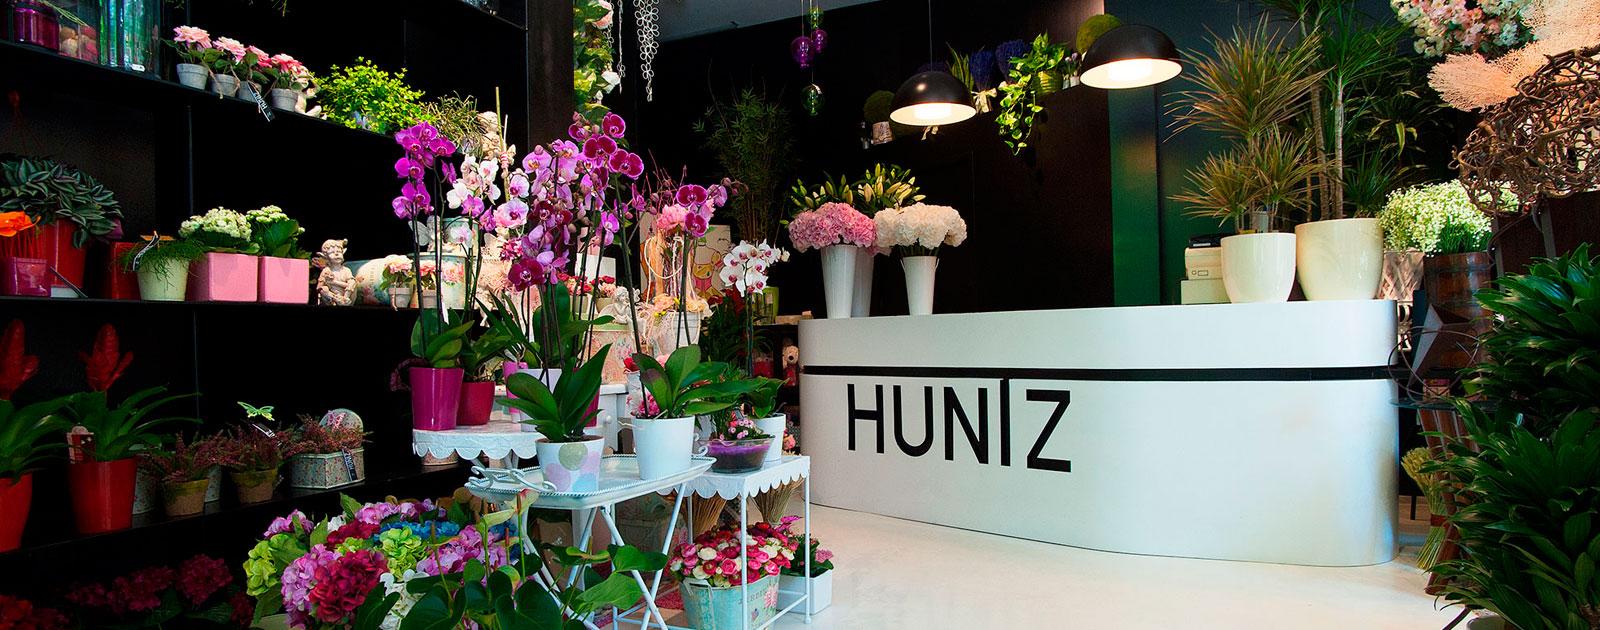 logotipo de HUNTZ ARTE-FLORAL SL